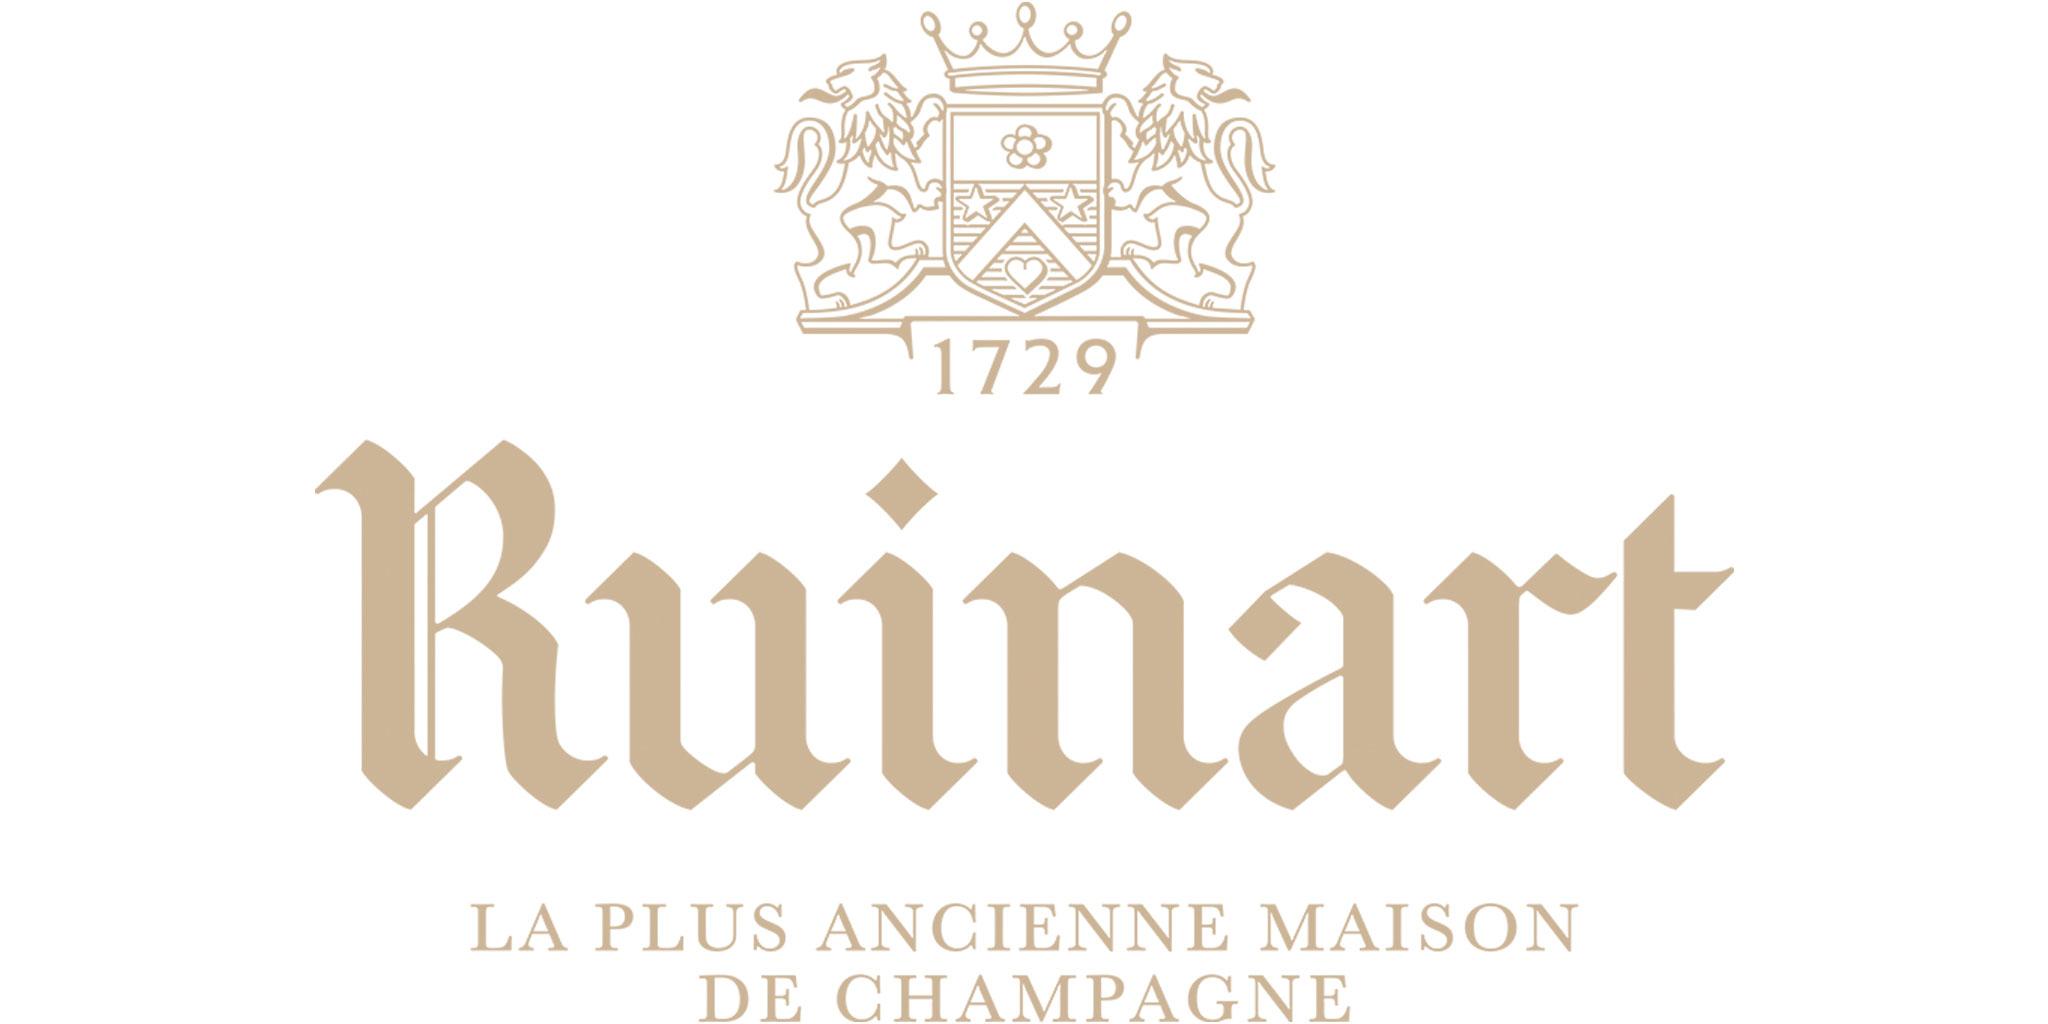 Ruinart champagne logo